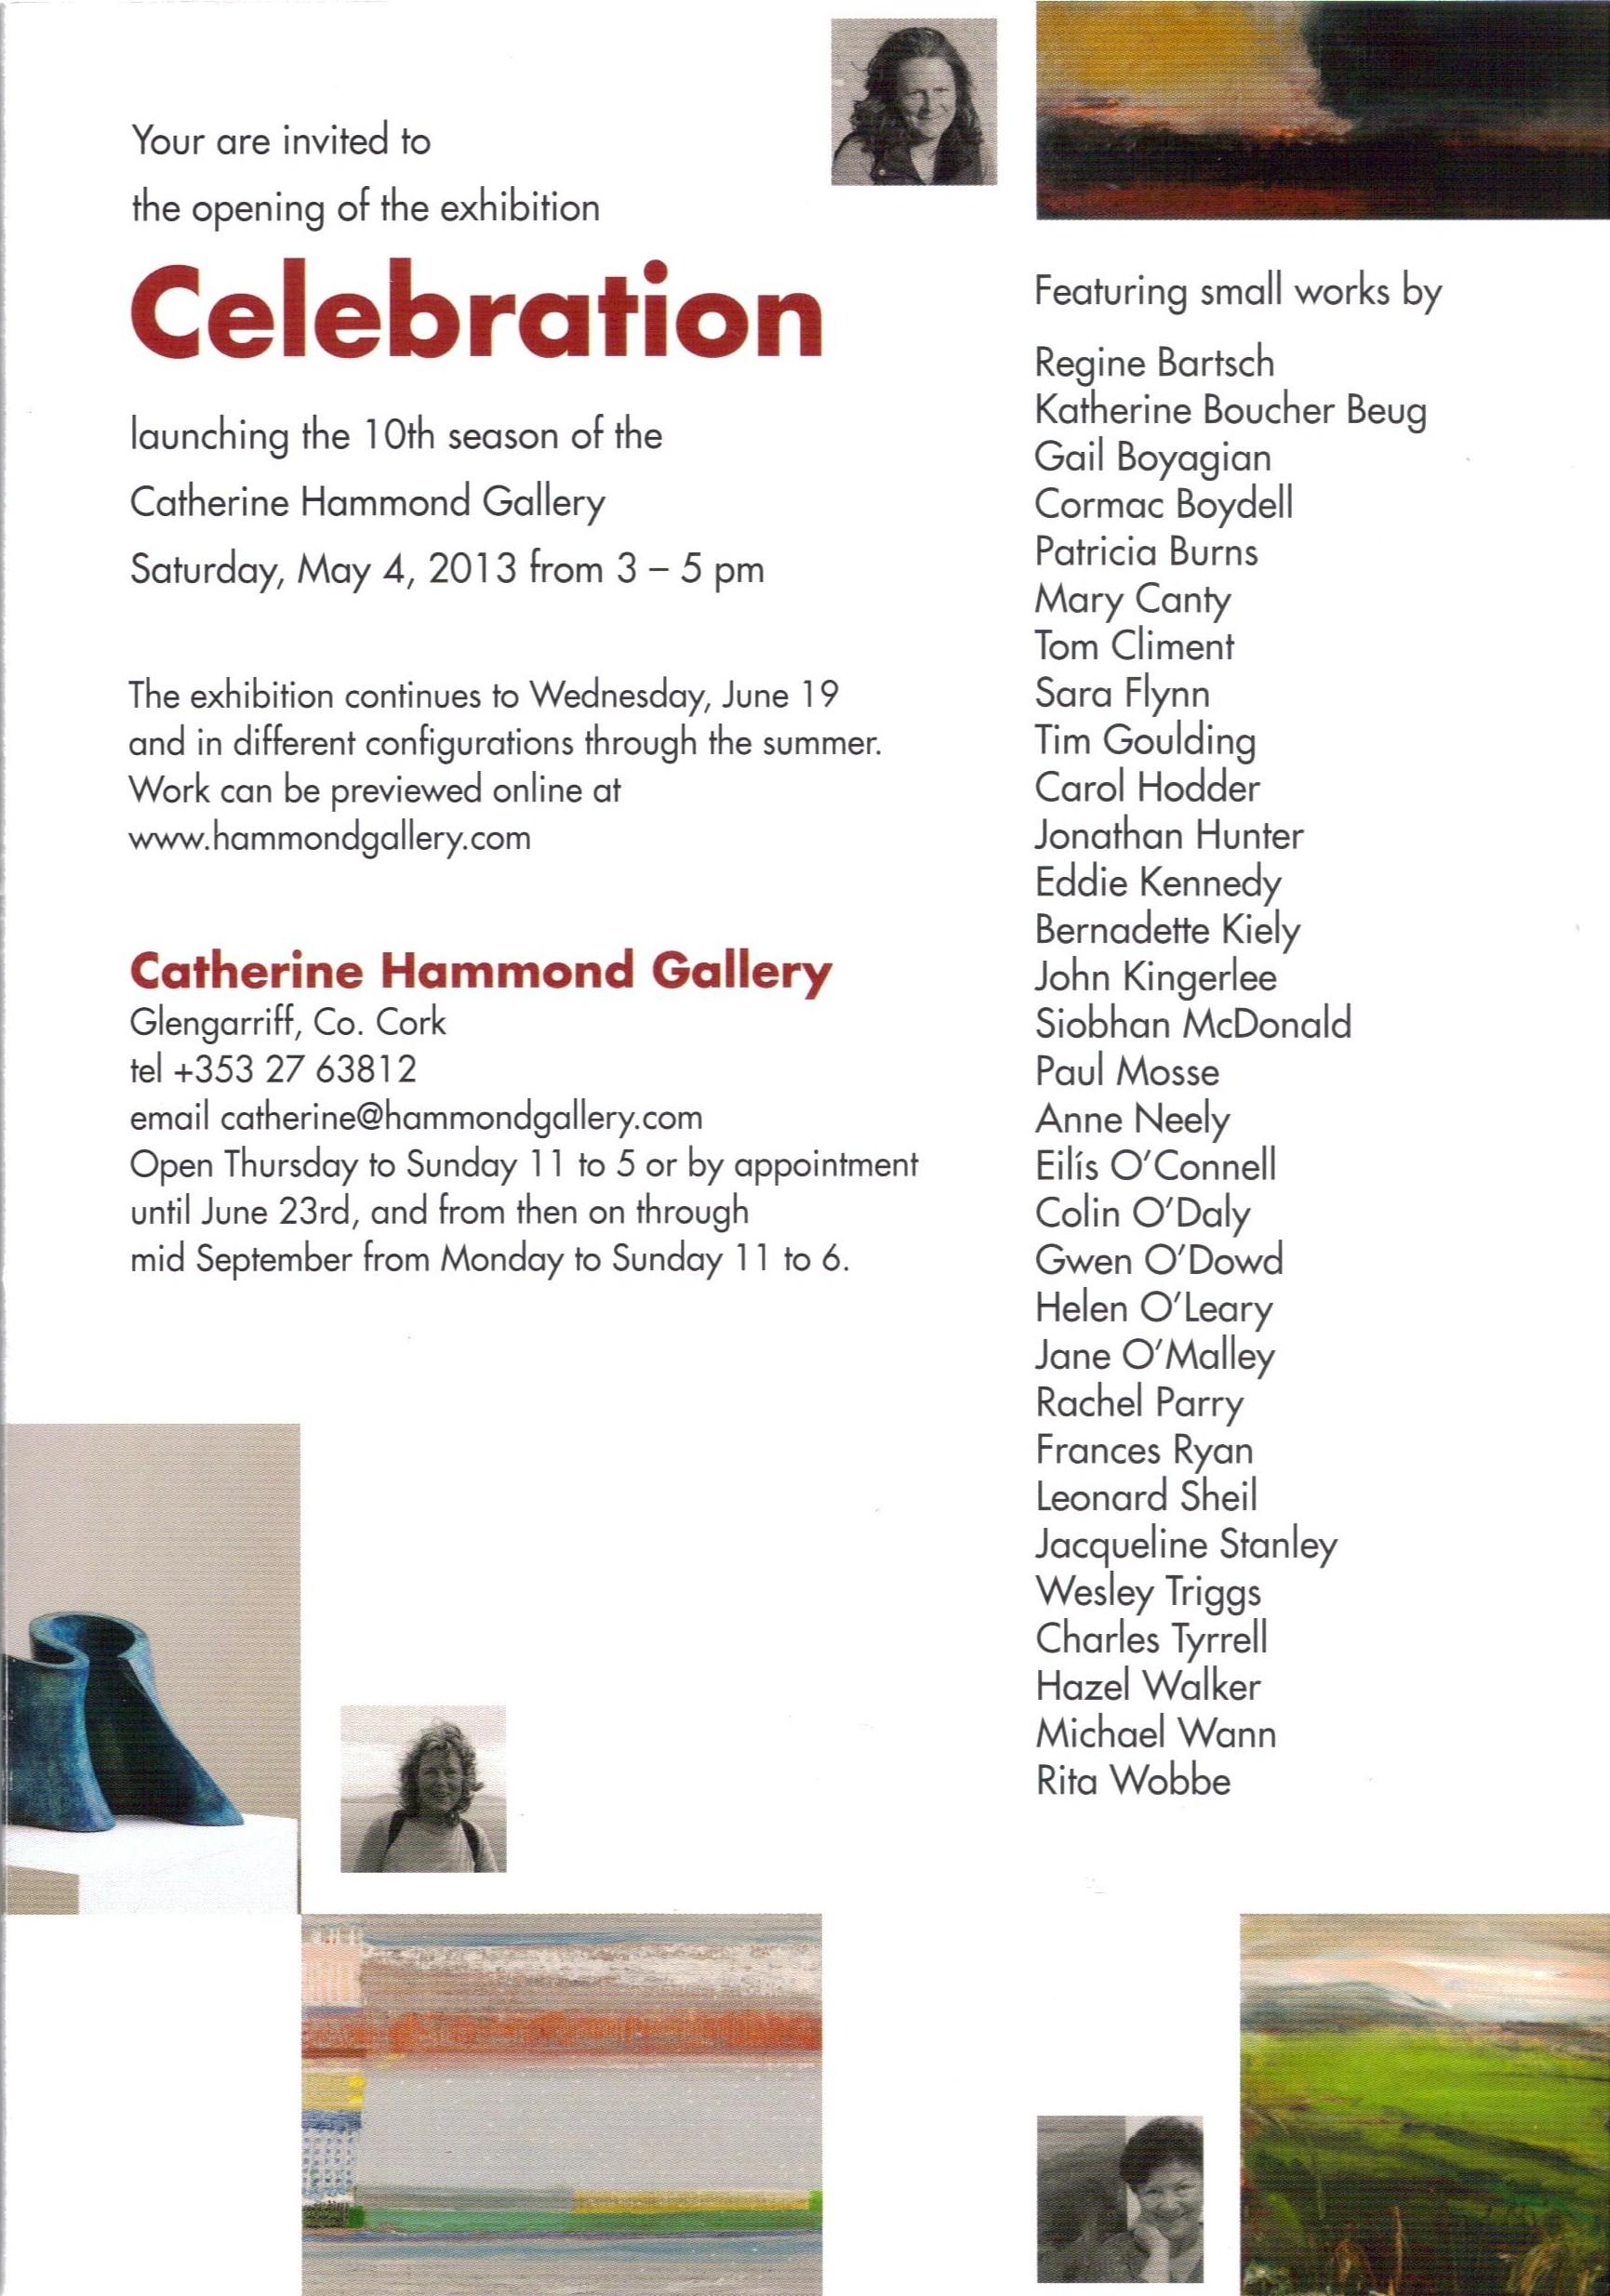 Invitation to Celebration at the Catherine Hammond Gallery